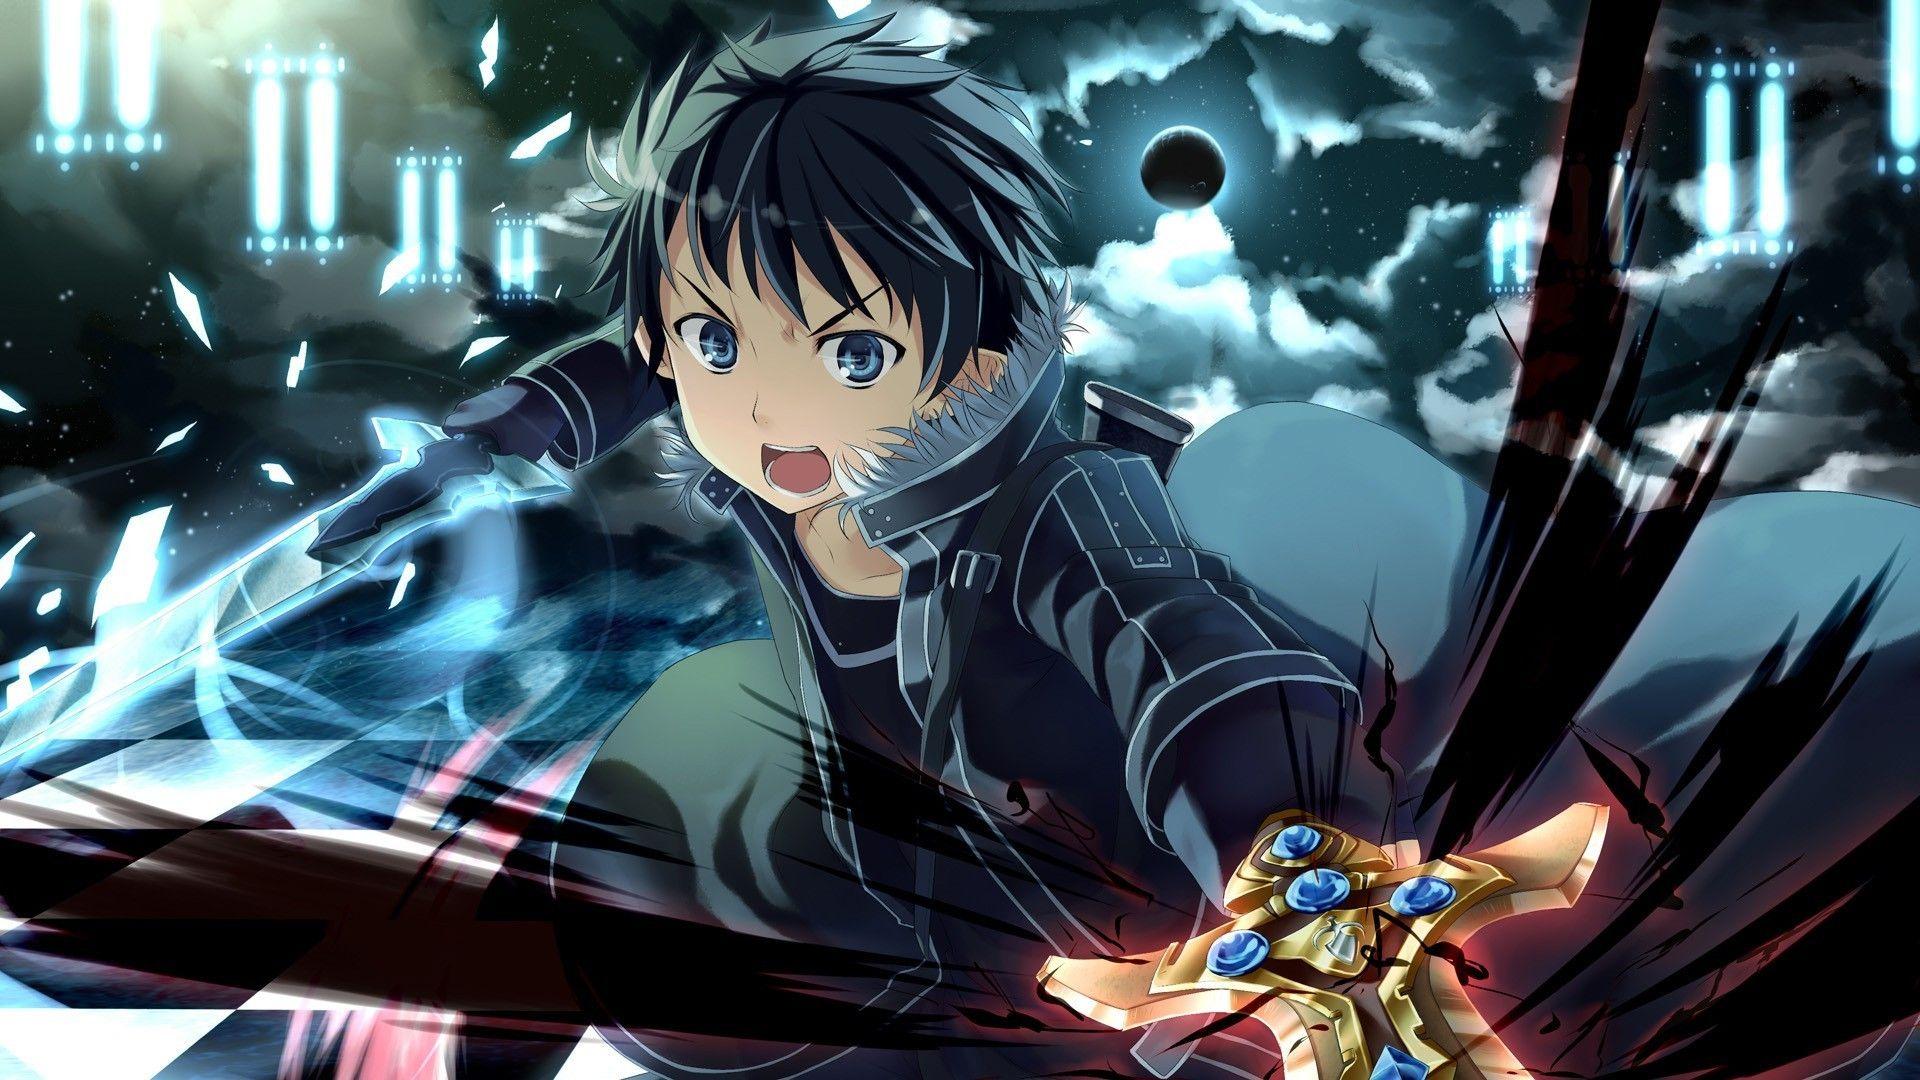 Pin By Rennoc Srednalf On Sao Sword Art Online Wallpaper Sword Art Online Season Sword Art Online Kirito